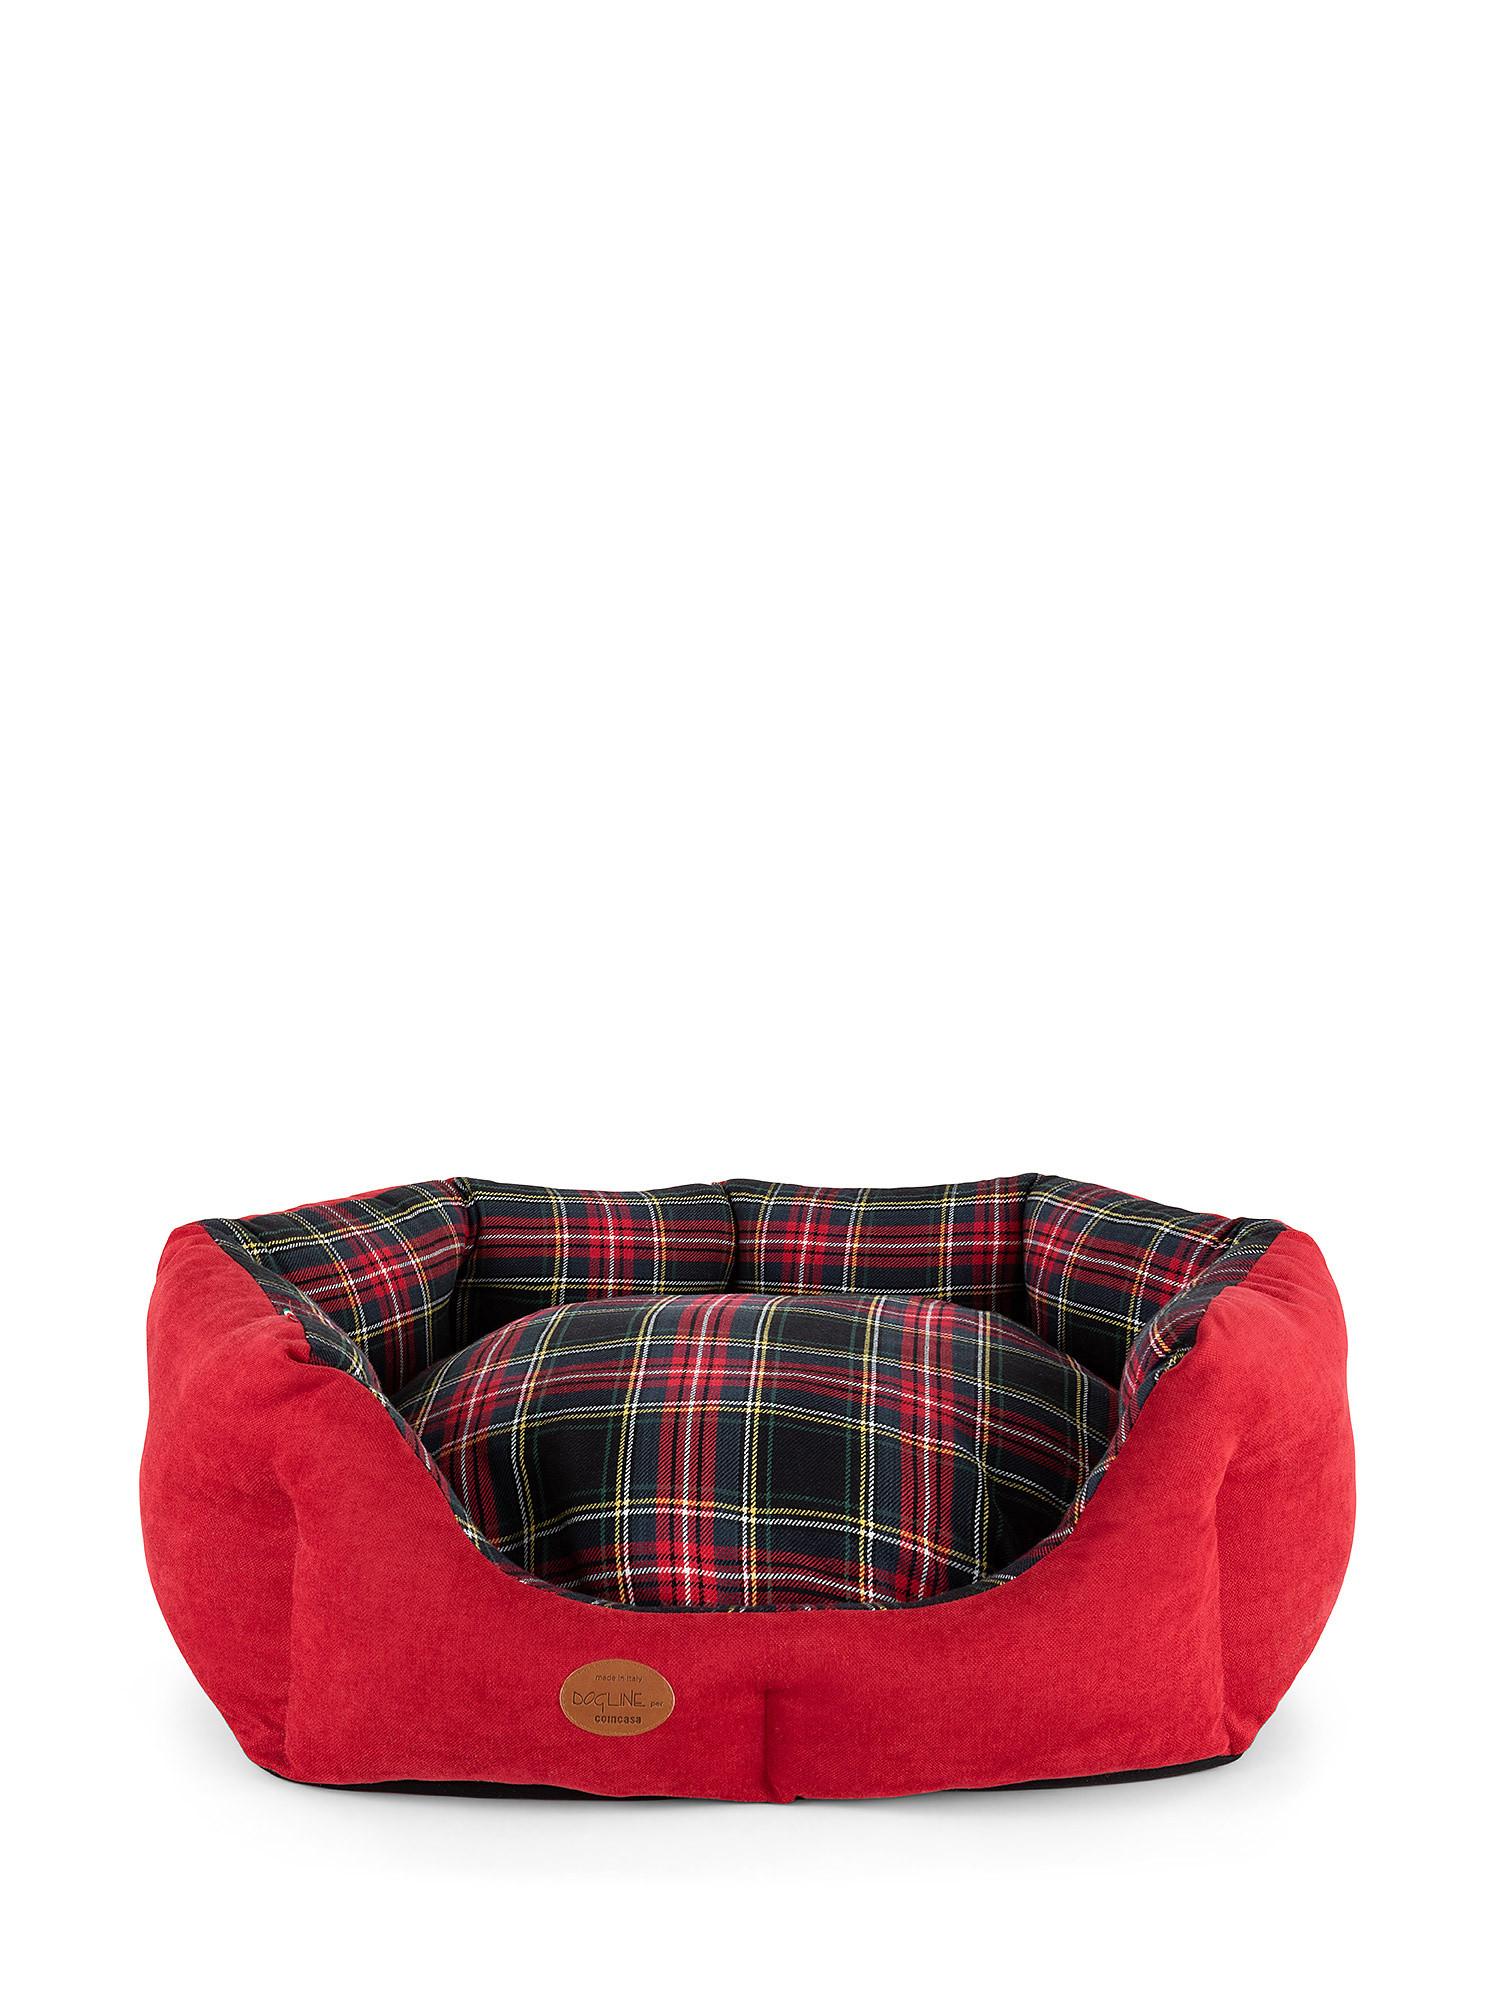 Cuccia trapuntata motivo tartan, Rosso, large image number 4